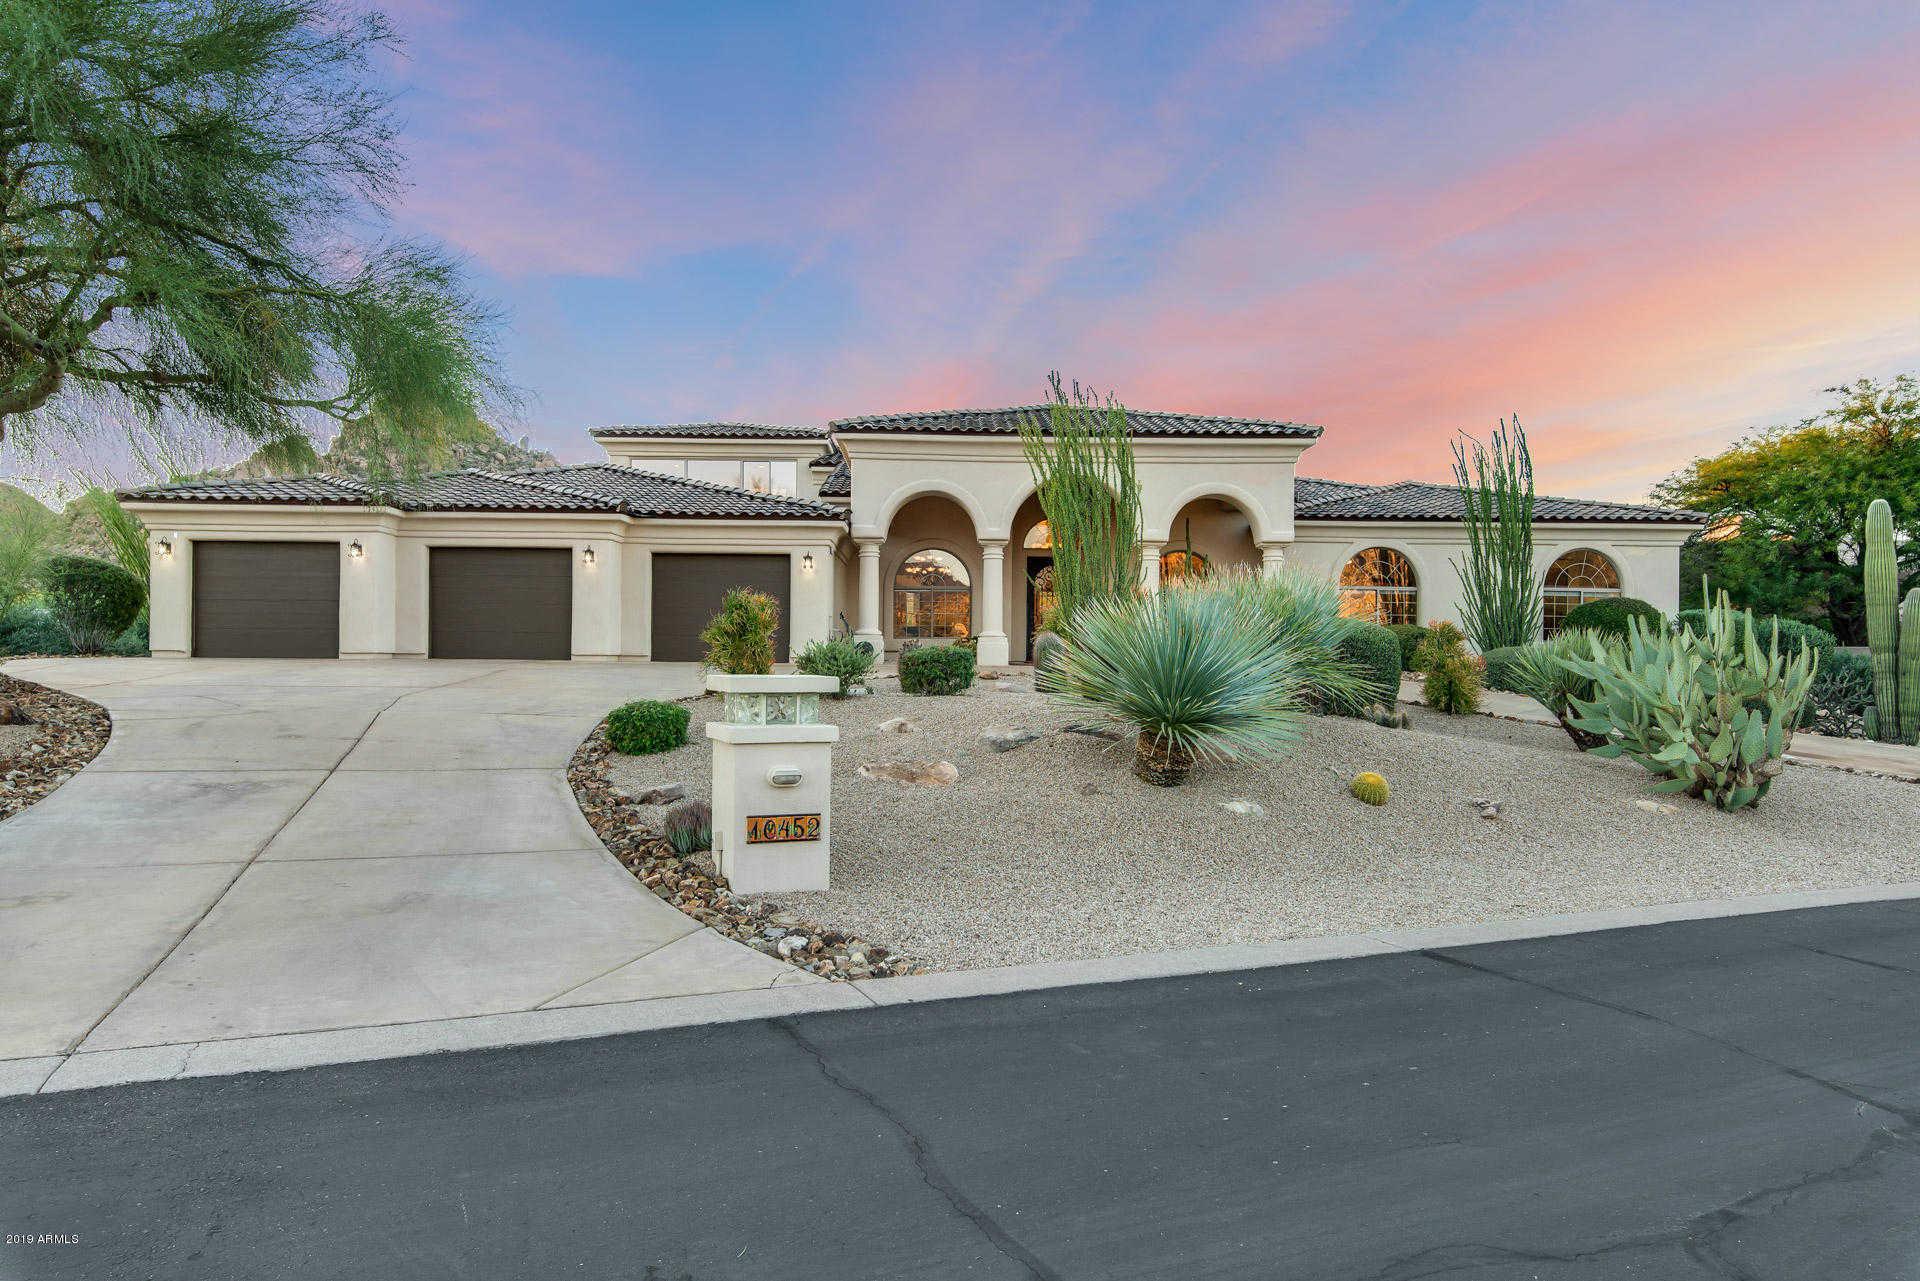 $1,248,800 - 5Br/4Ba - Home for Sale in Troon Fairways, Scottsdale